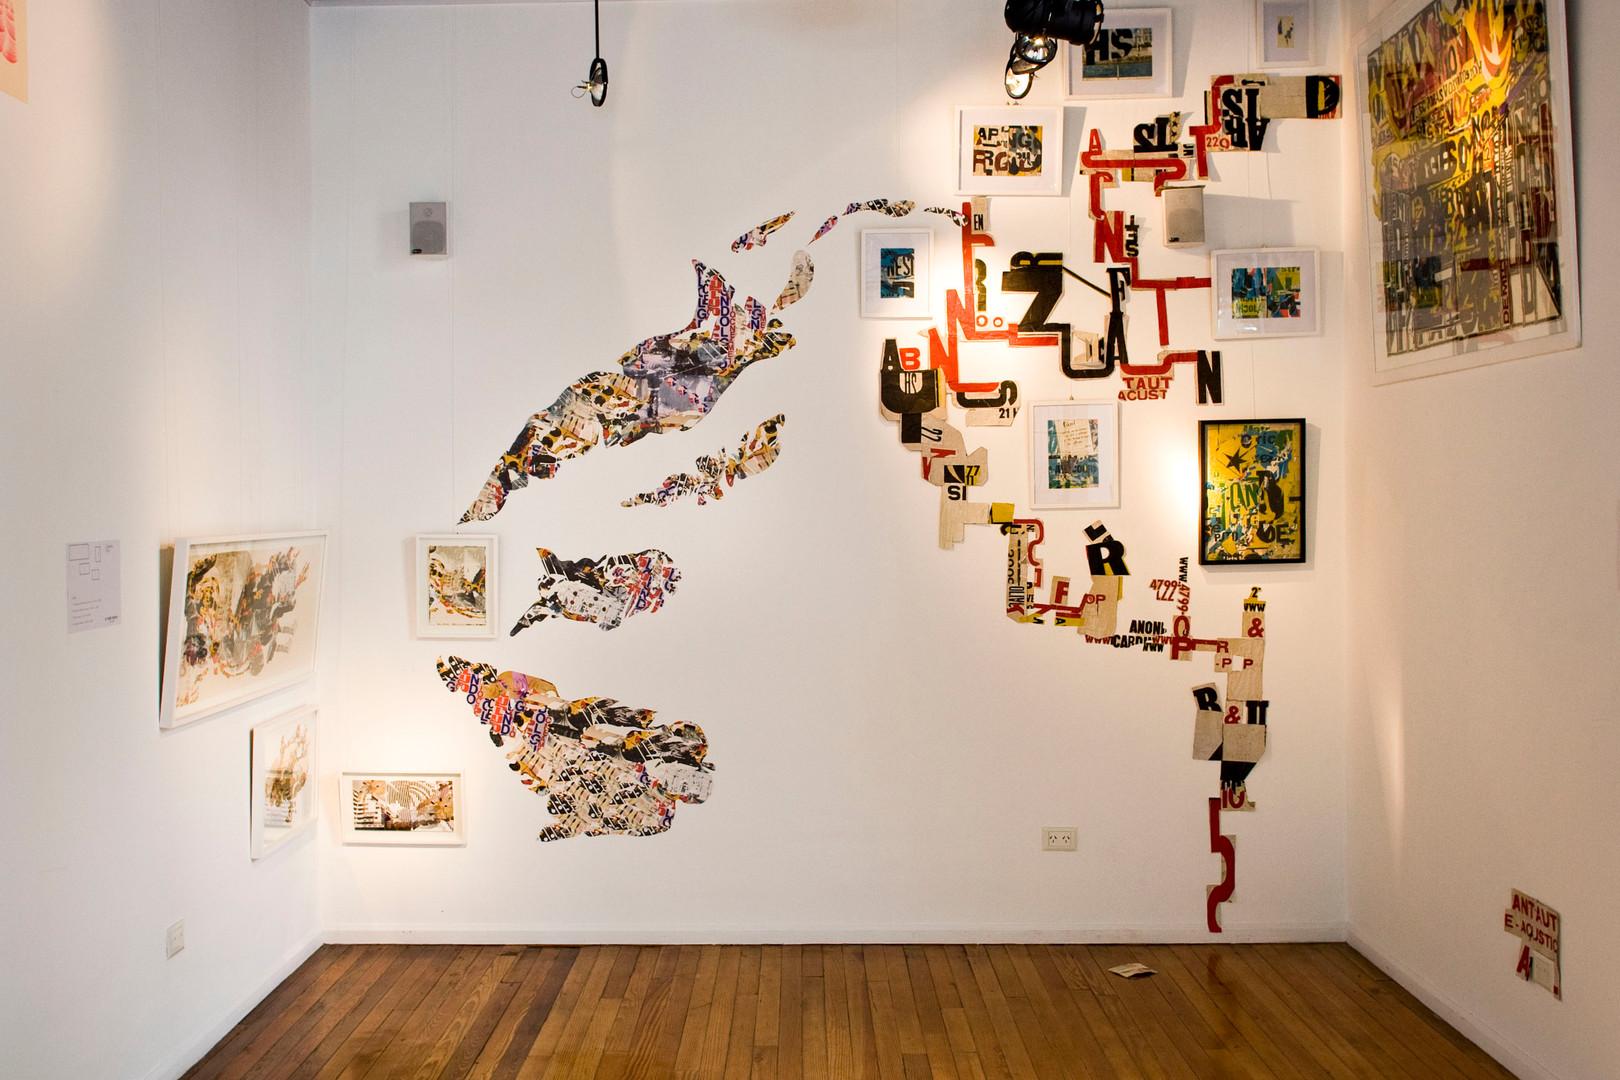 Installation on wall